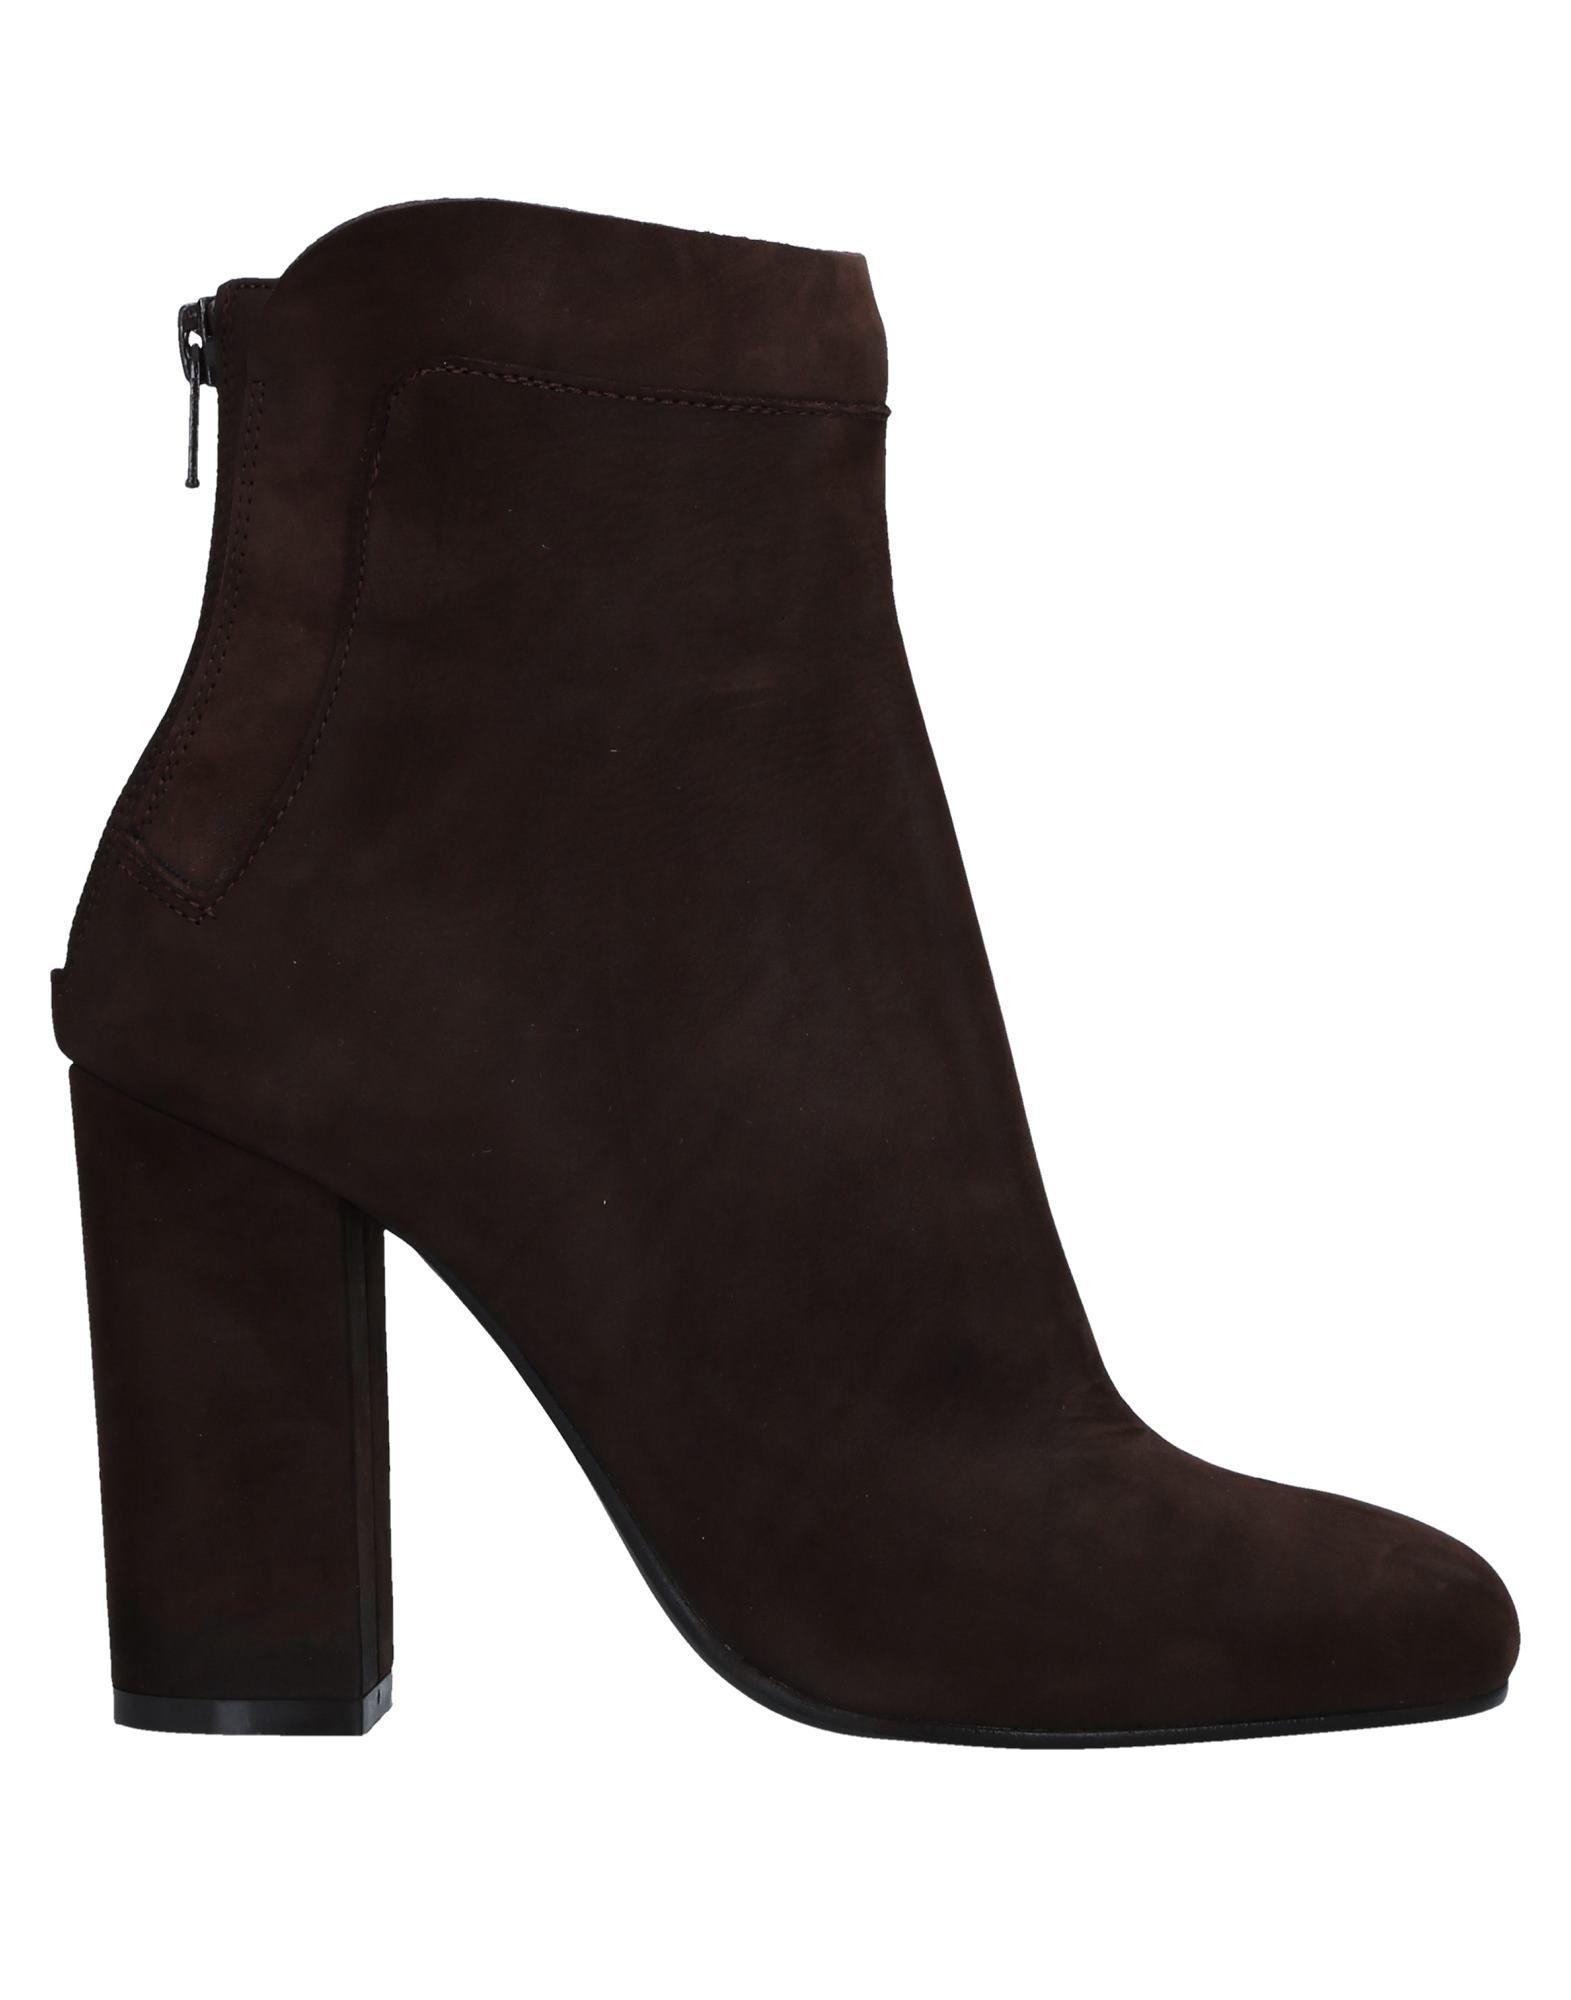 Bottine Fiorifrancesi Femme - Bottines Fiorifrancesi Noir Chaussures casual sauvages